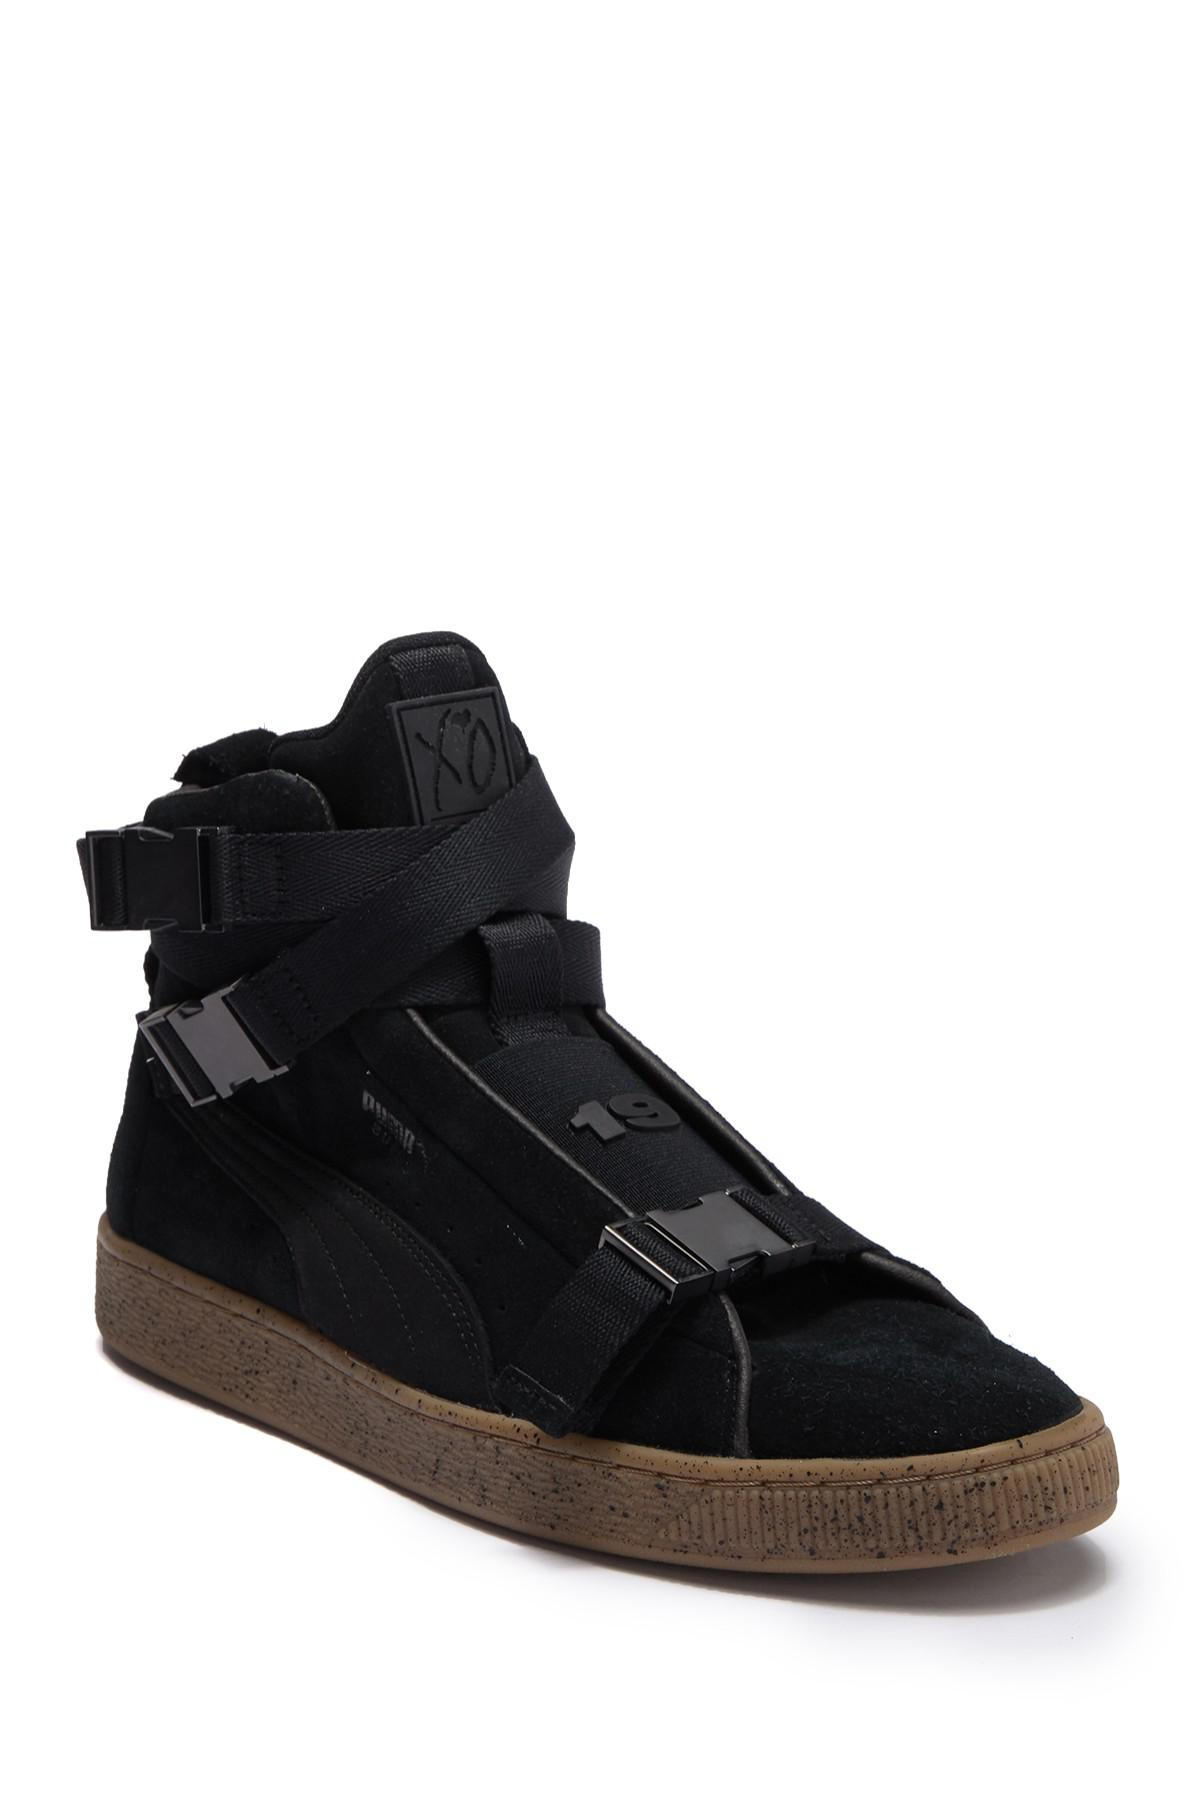 3c2b5837c5b88d Lyst - PUMA Suede Classic X The Weeknd High Top Sneaker in Black for Men